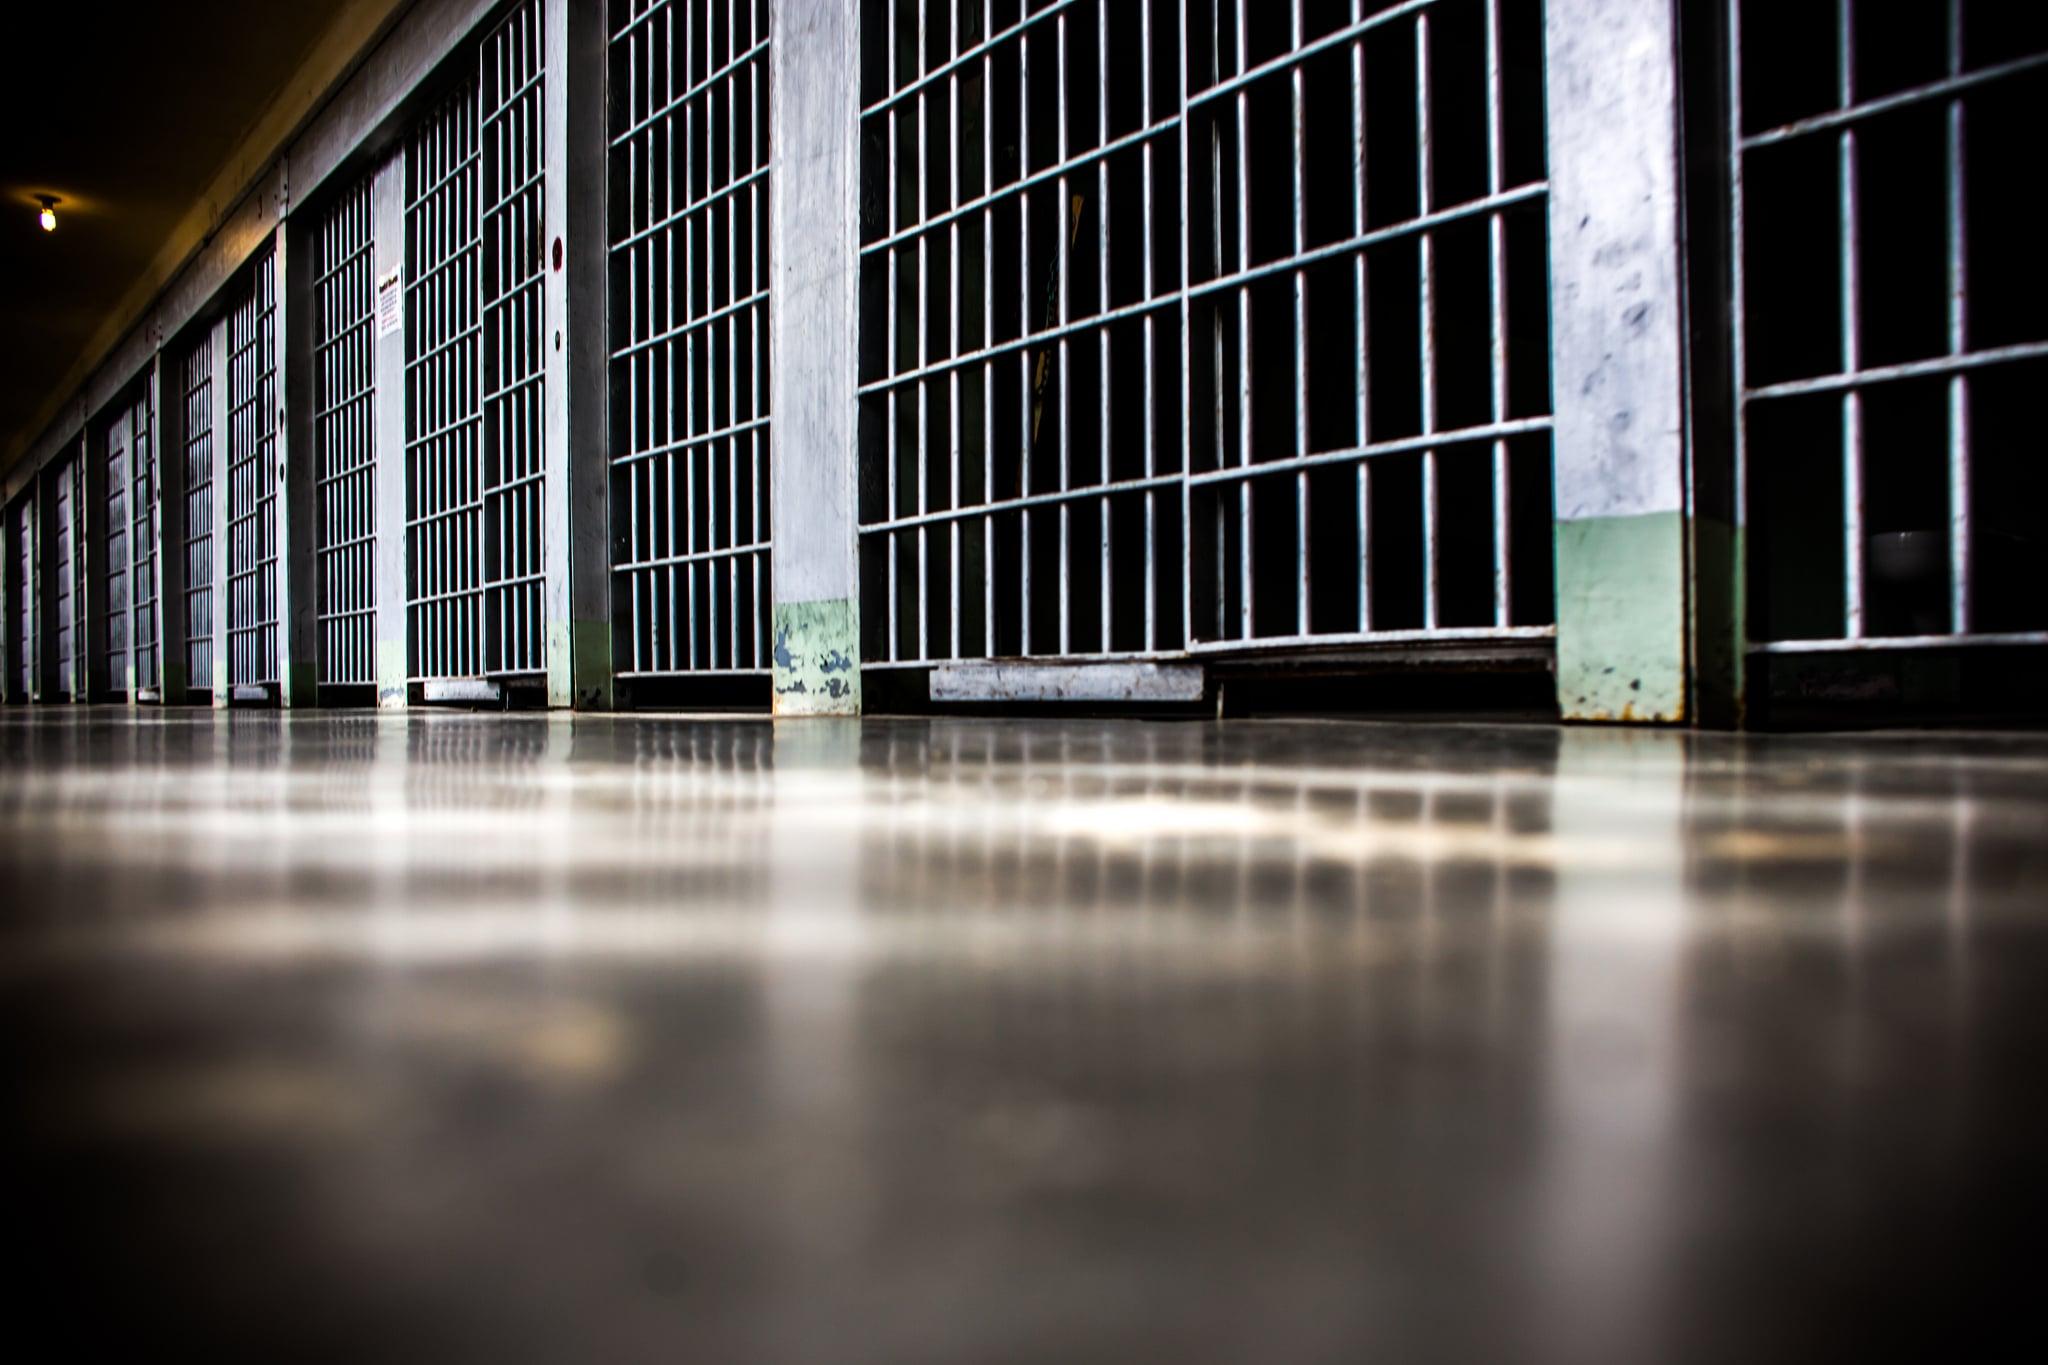 Prison Bound by  Thomas Hawk  via Flickr CCL.